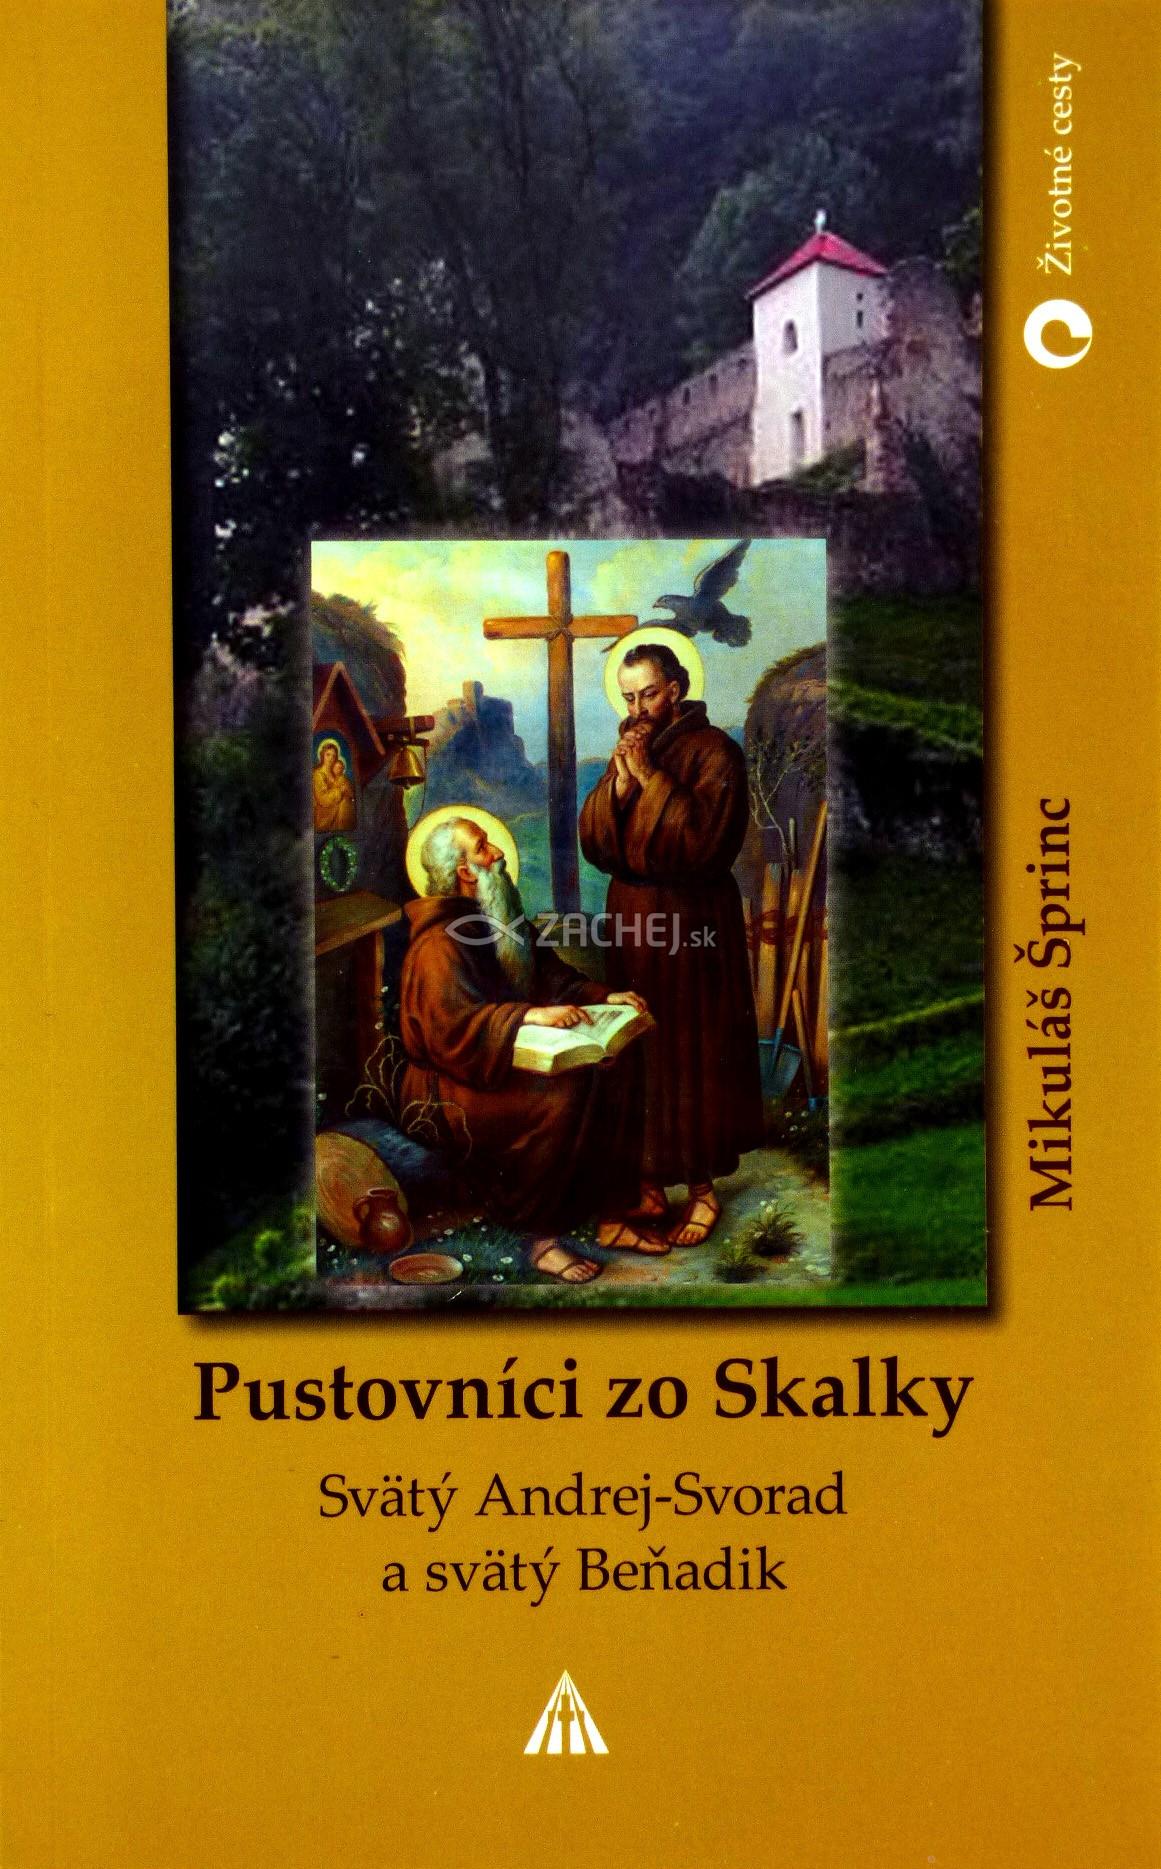 Pustovníci zo Skalky - Svätý Andrej-Svorad a svätý Beňadik